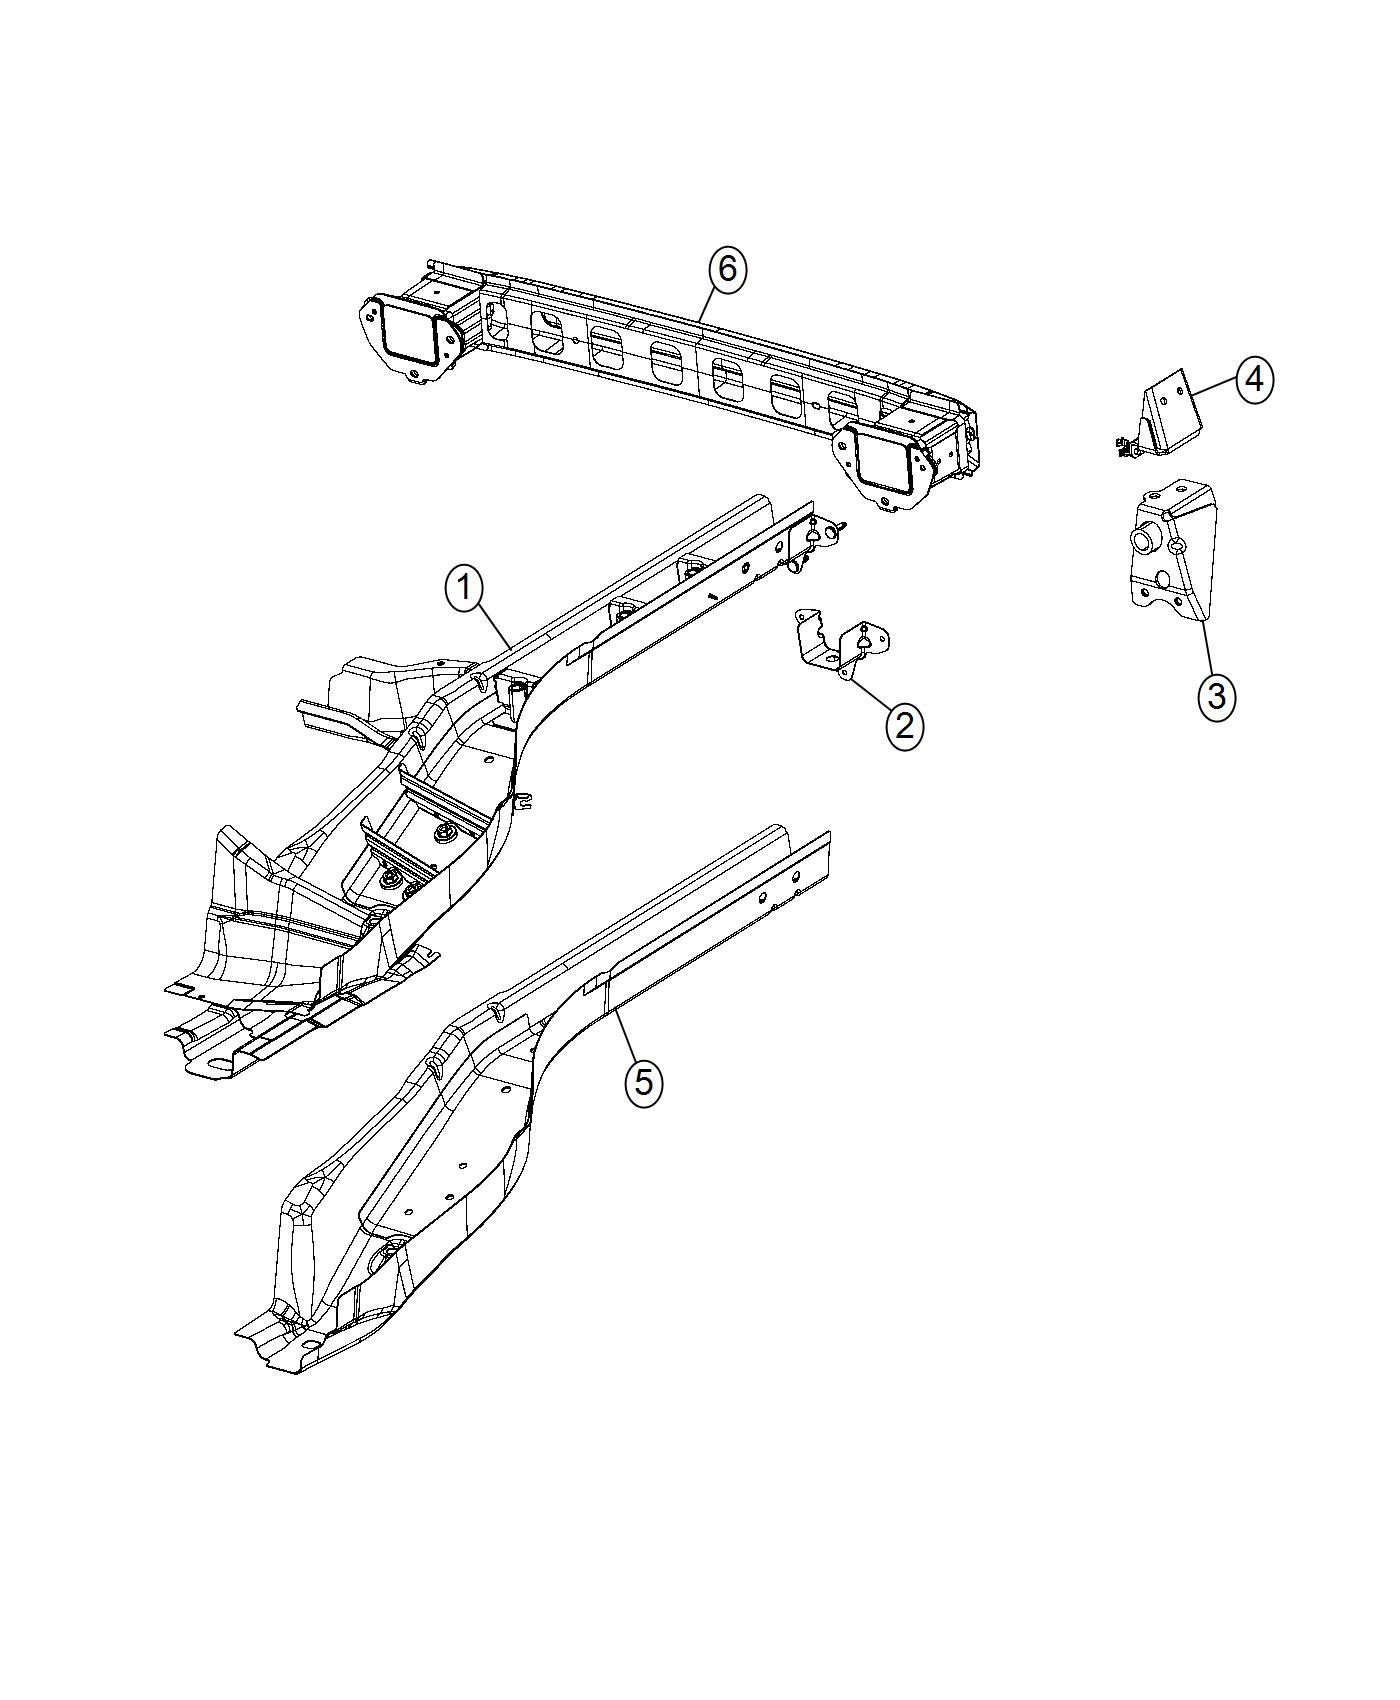 2016 Jeep Renegade Bracket. Tow hook. Left. Hooks, front